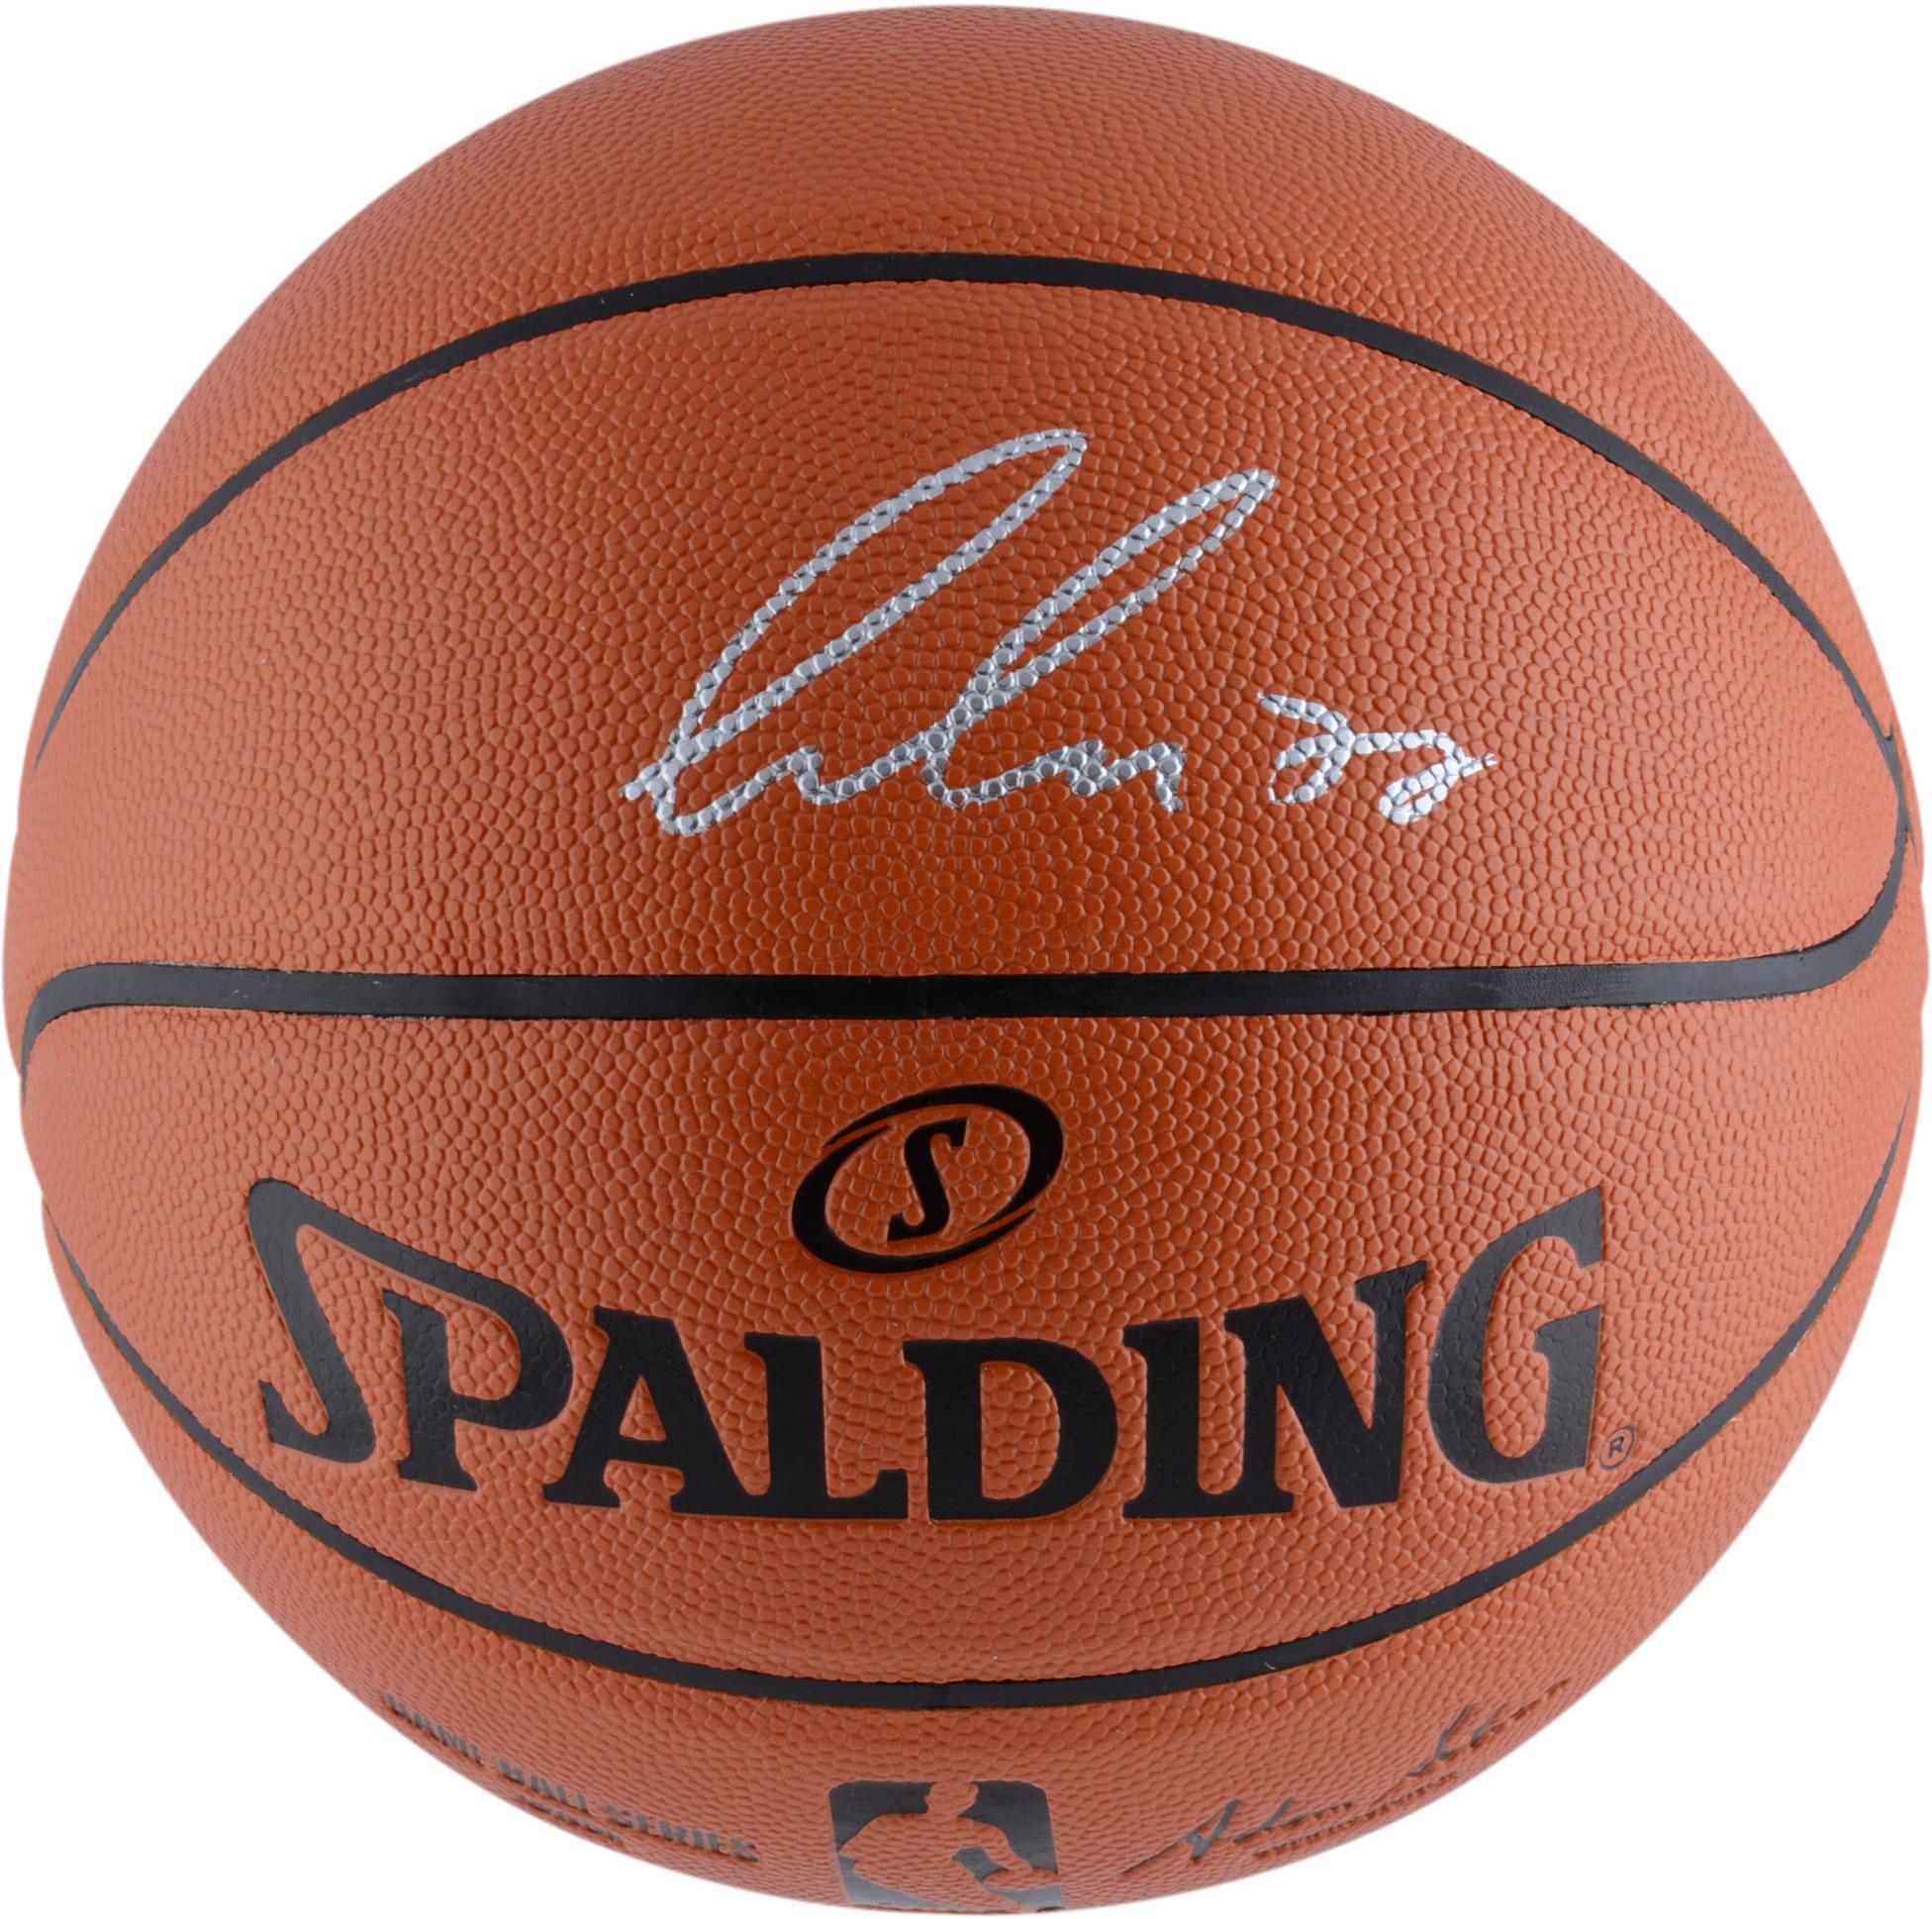 Luka Doncic Dallas Mavericks Autographed Spalding Indoor Outdoor Basketball - Fanatics Authentic Certified